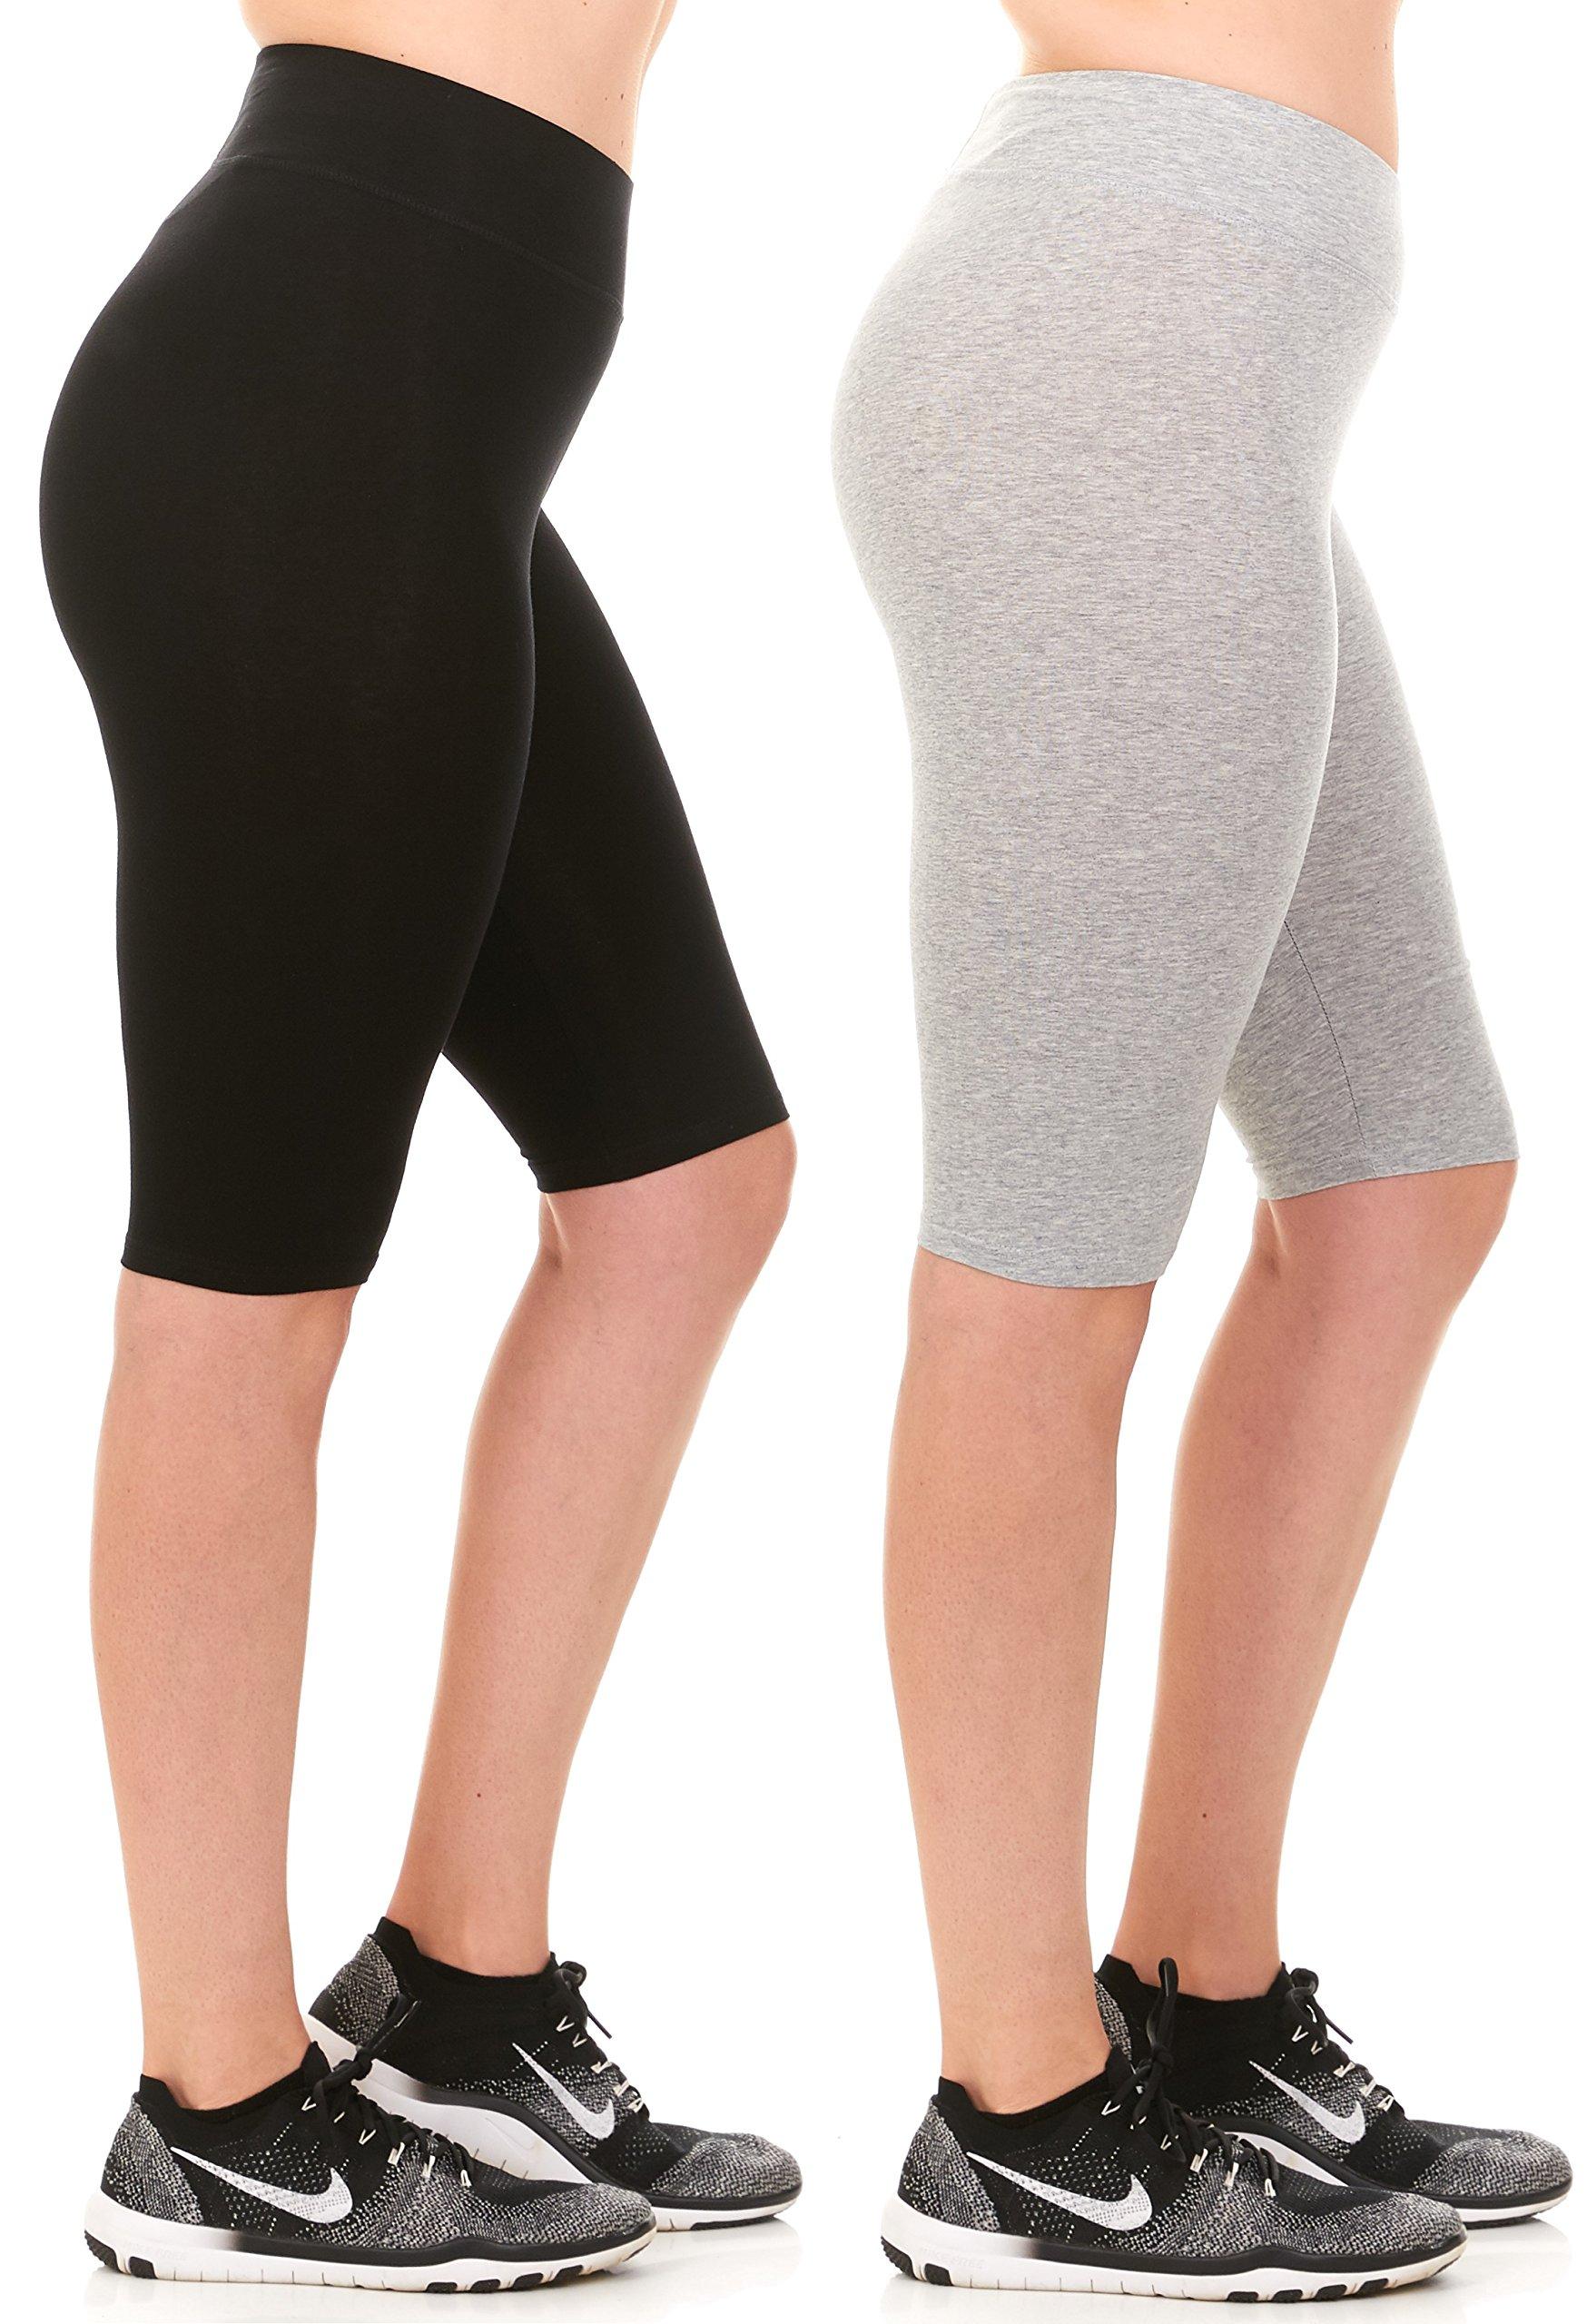 Unique Styles Womens Cotton Capri Leggings High Waistband Biker Shorts for Women